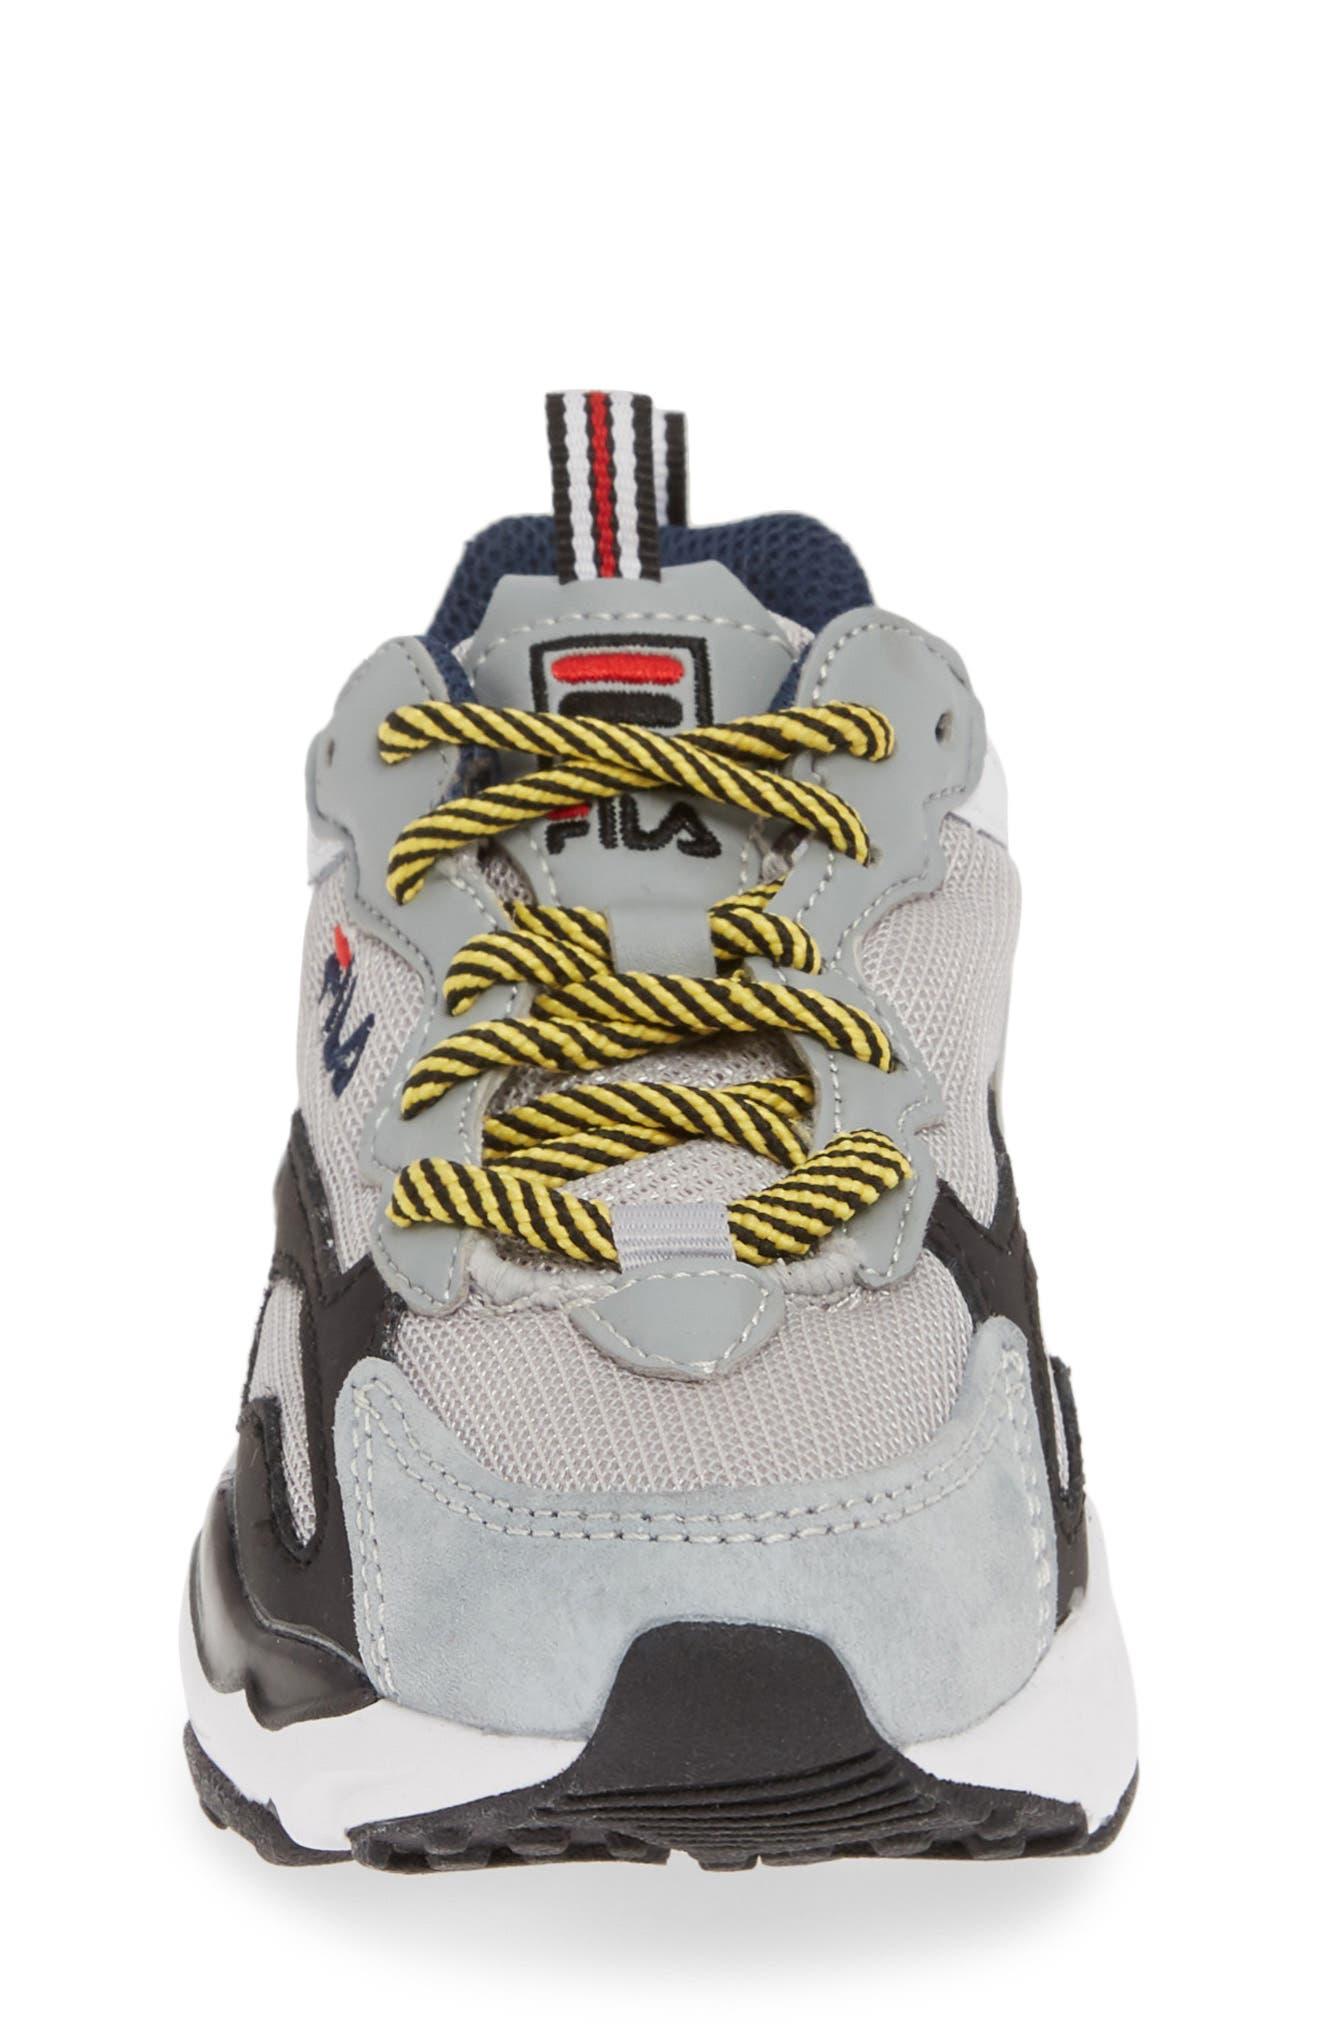 FILA,                             Ray Tracer Sneaker,                             Alternate thumbnail 4, color,                             VAPOR BLUE/ HIGHRISE/ BLACK